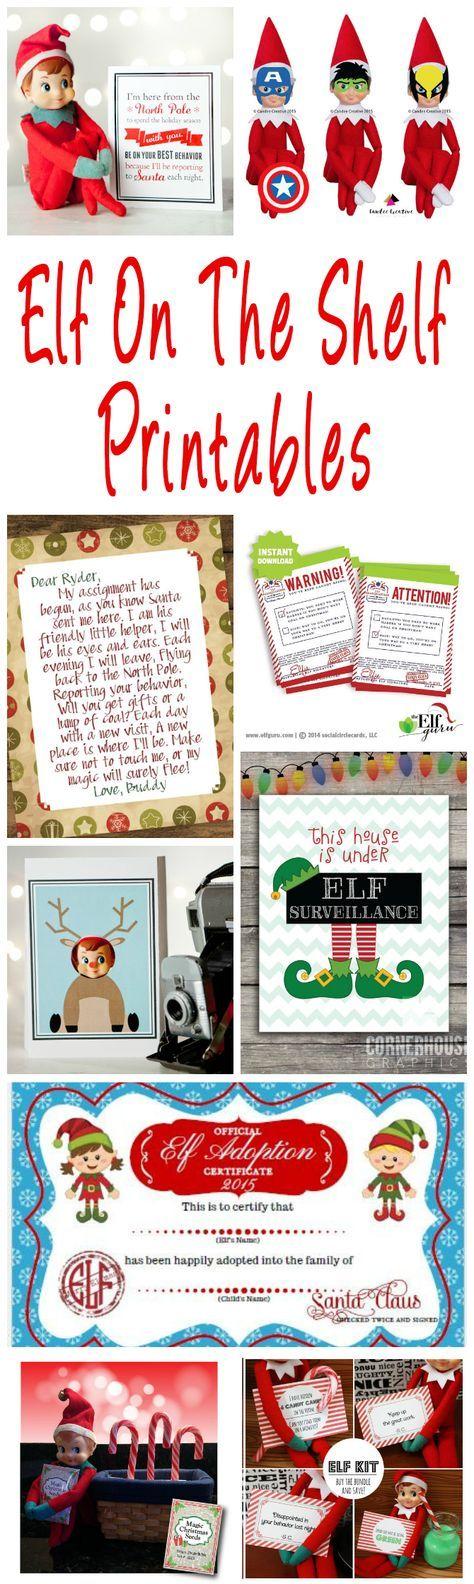 40 Fun & Creative Christmas Elf On The Shelf Printables